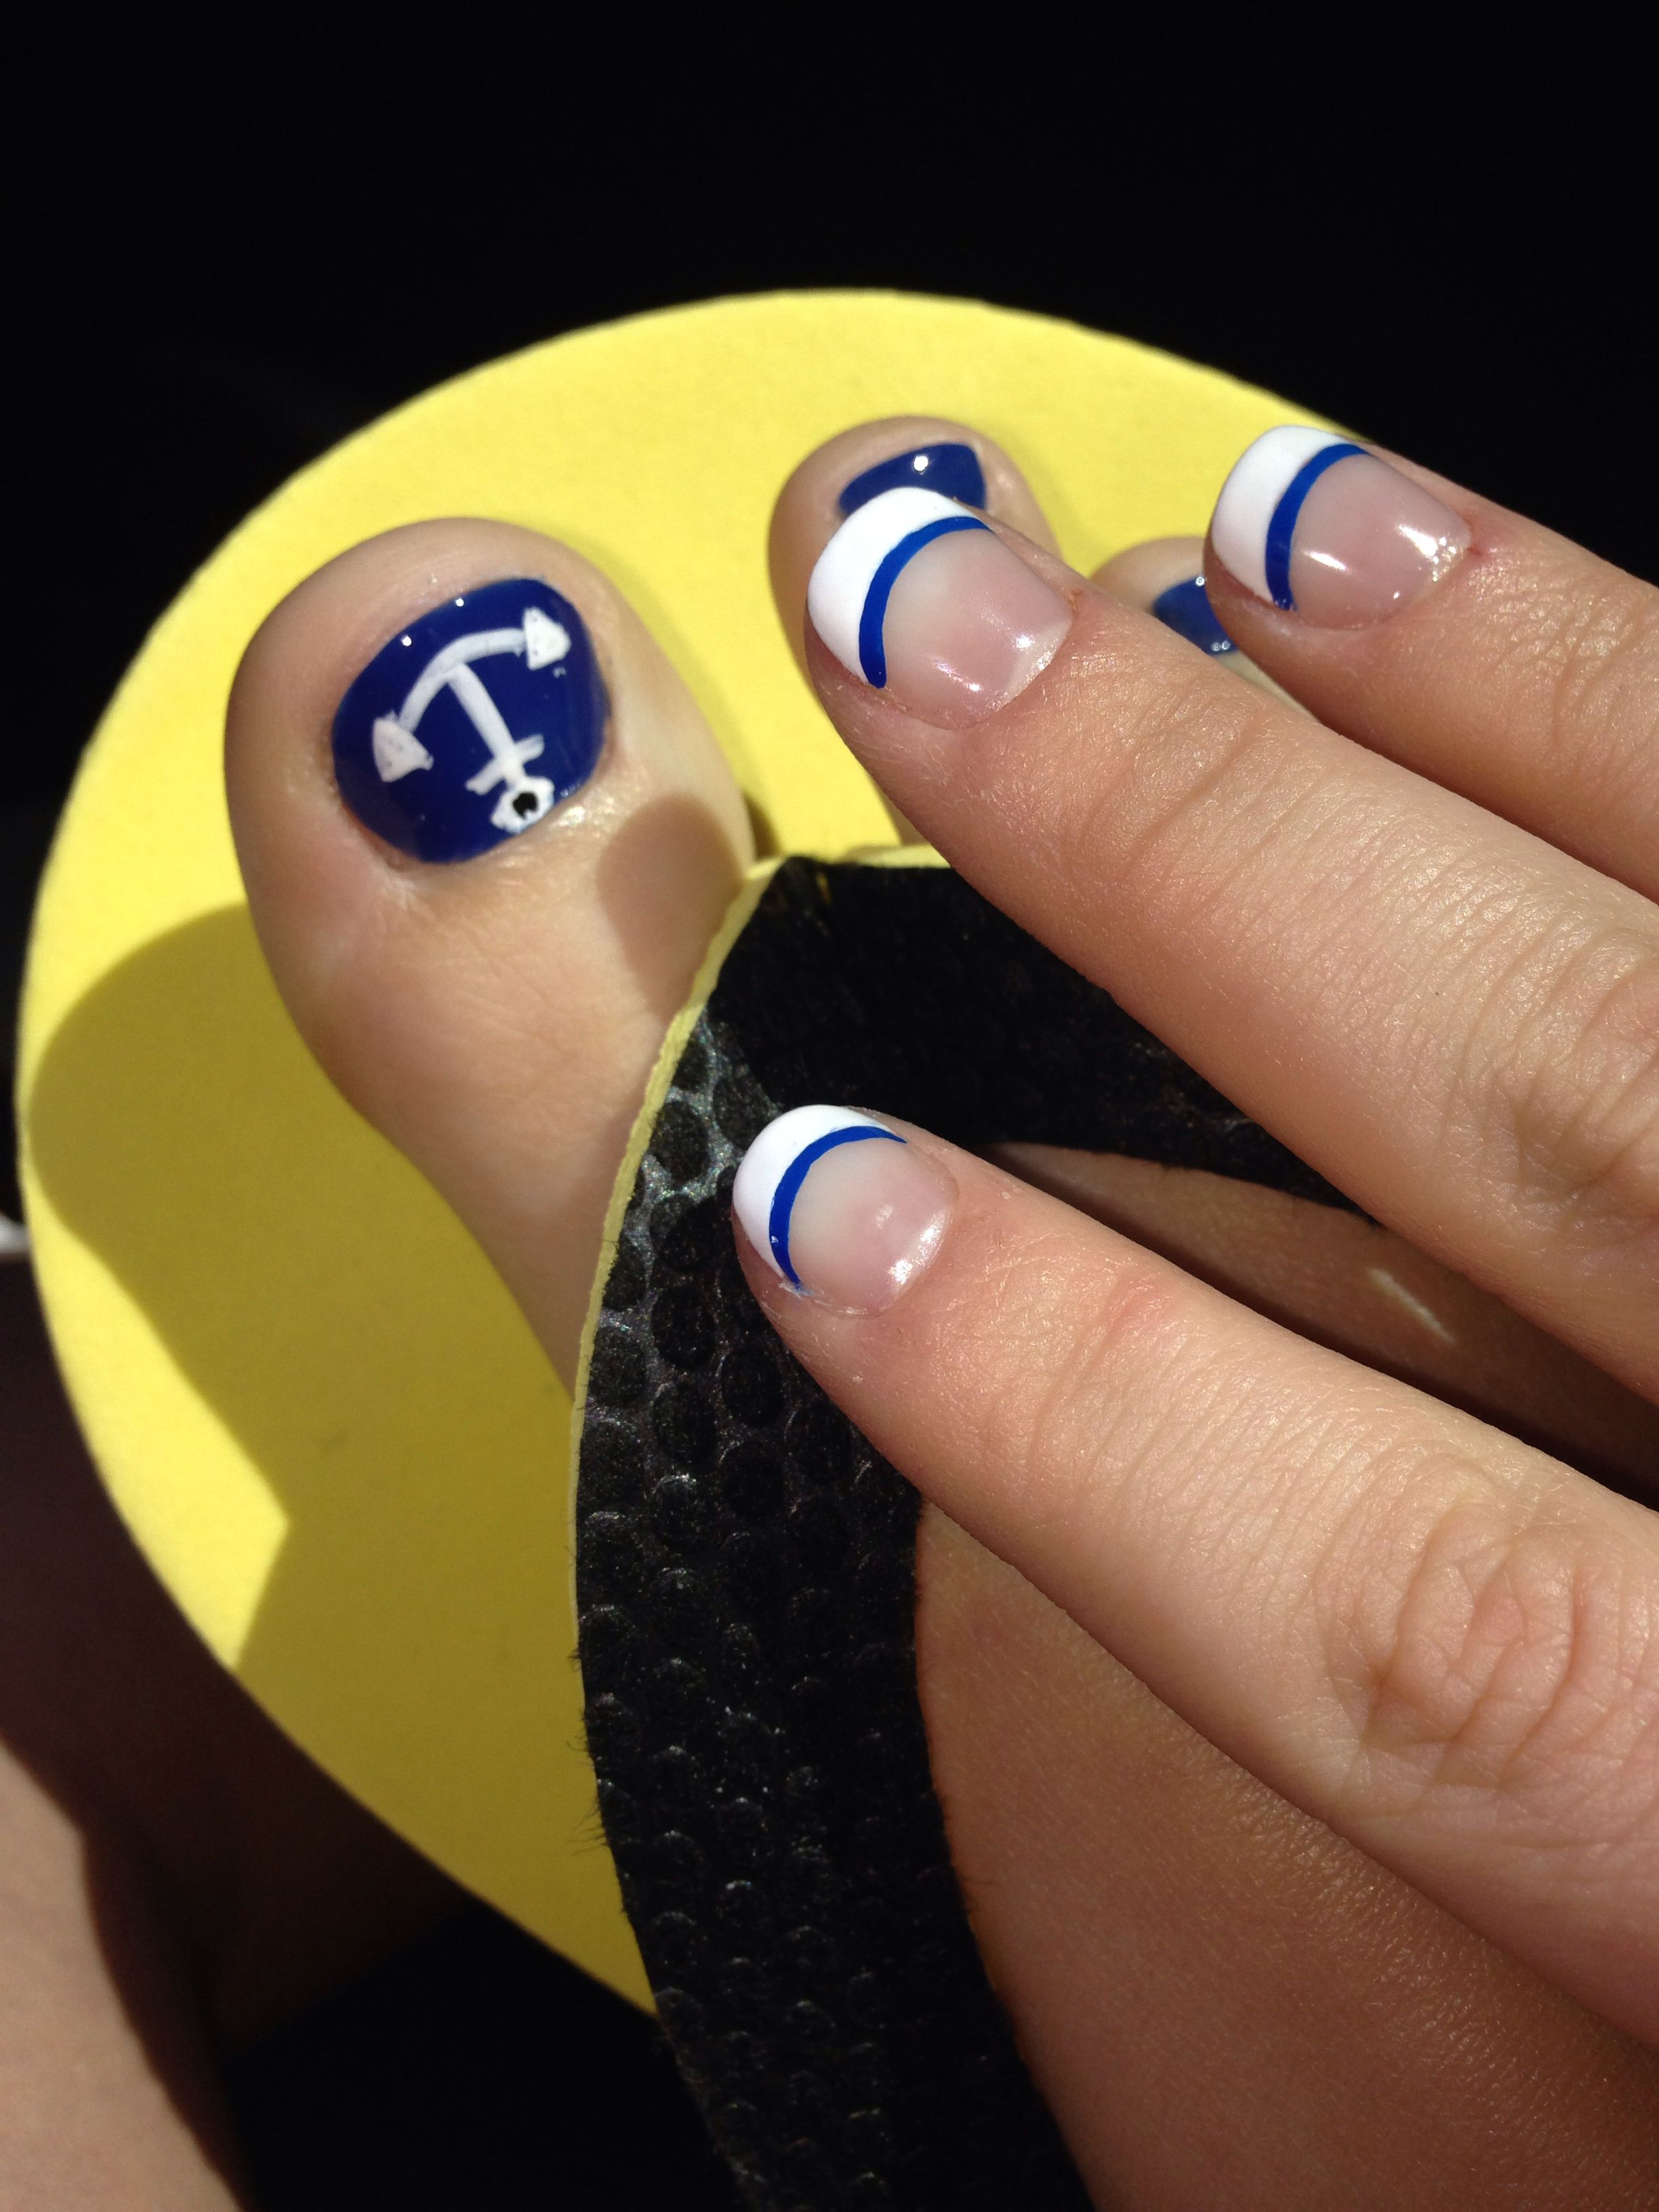 Cruise nails | Nails | Pinterest | Cruise nails, Cruises and Mani pedi